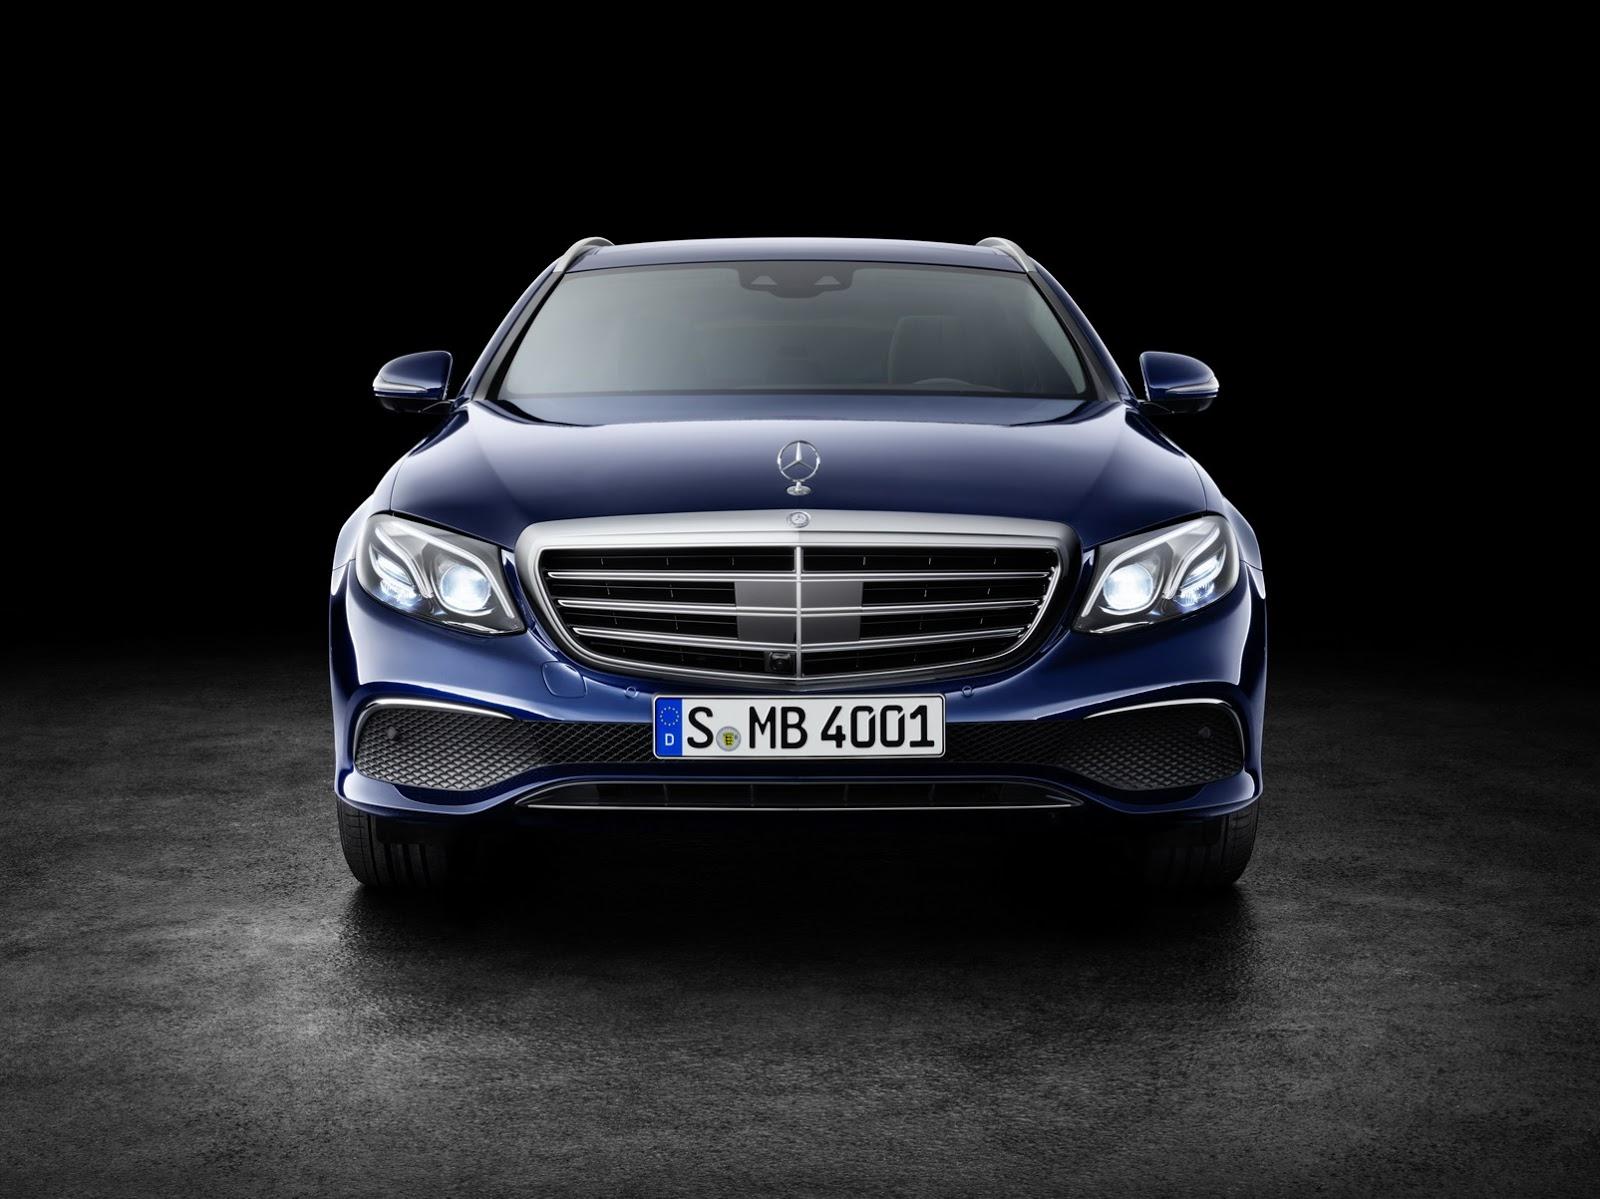 2017-Mercedes-Estate-E-Class-13.jpg